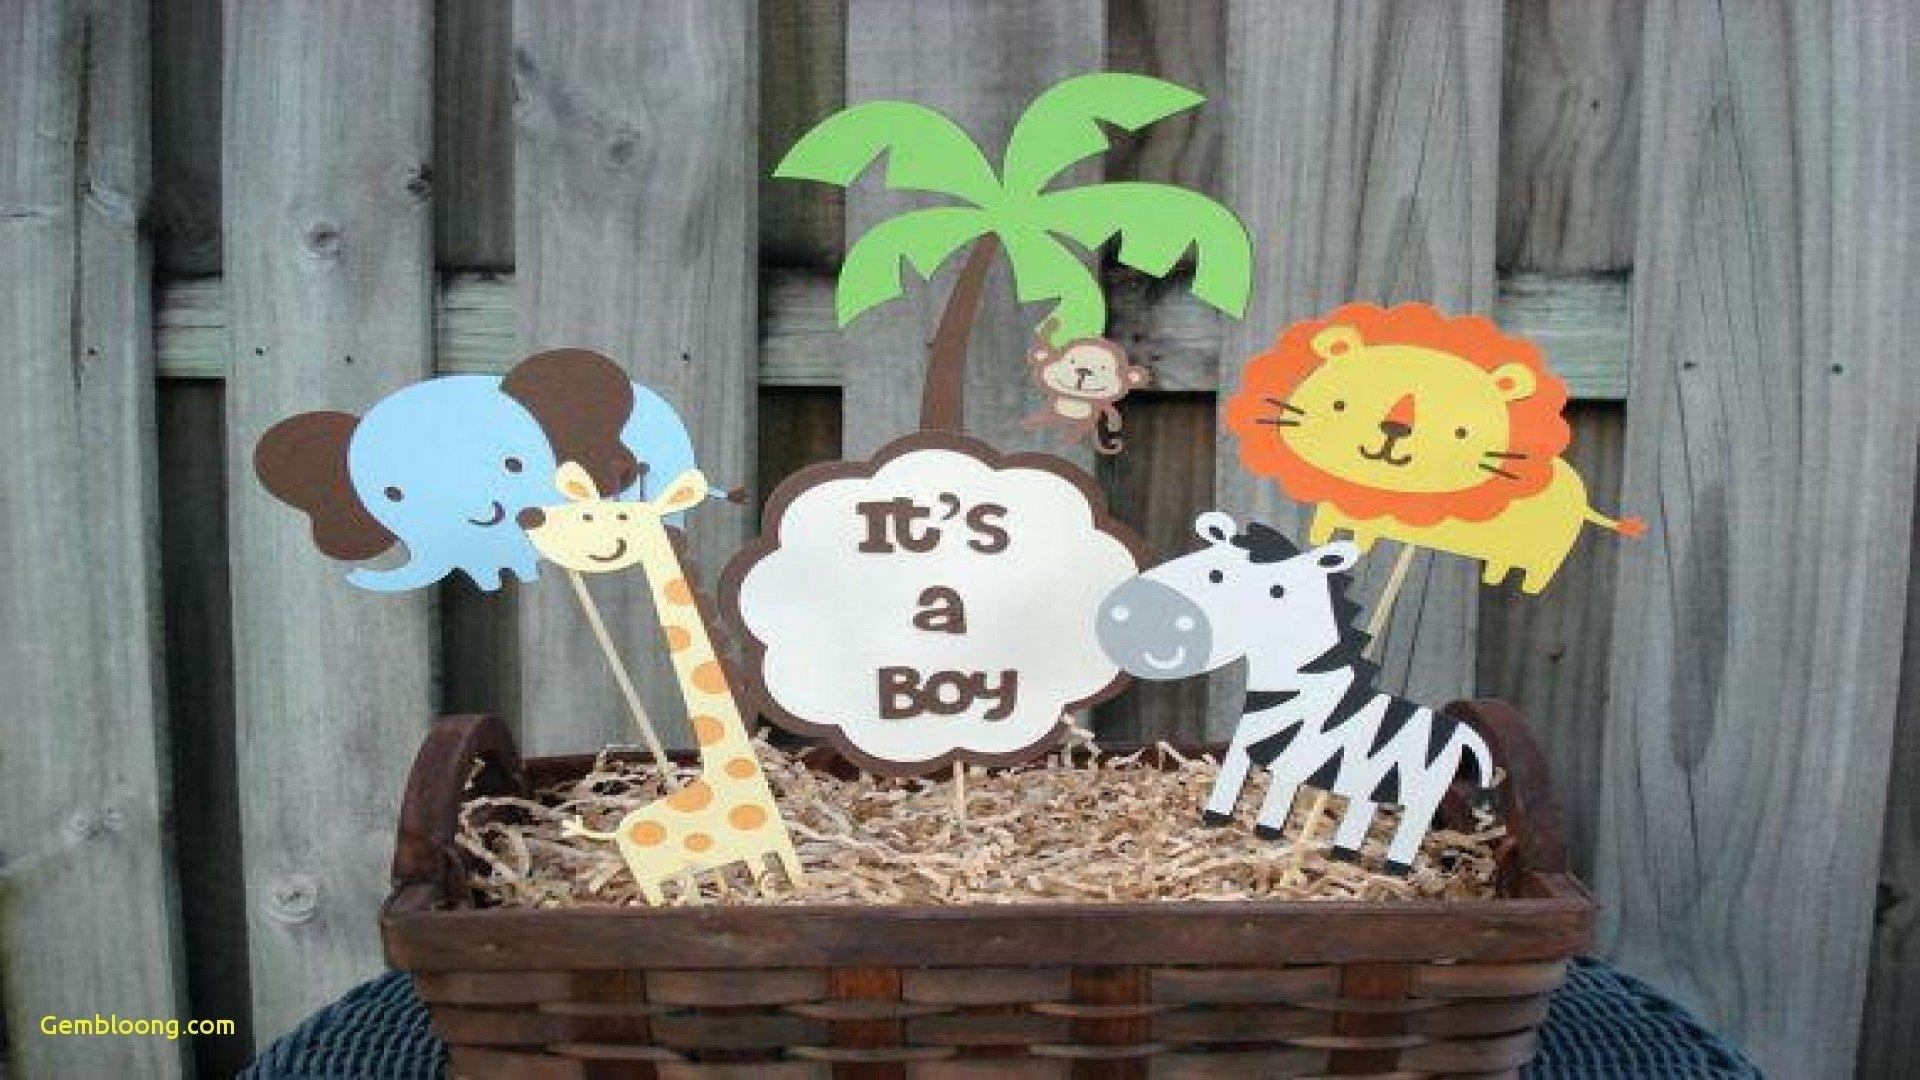 10 Famous Baby Shower Safari Theme Ideas safari theme baby shower ideas baby shower gift ideas wallpapernotes 2020